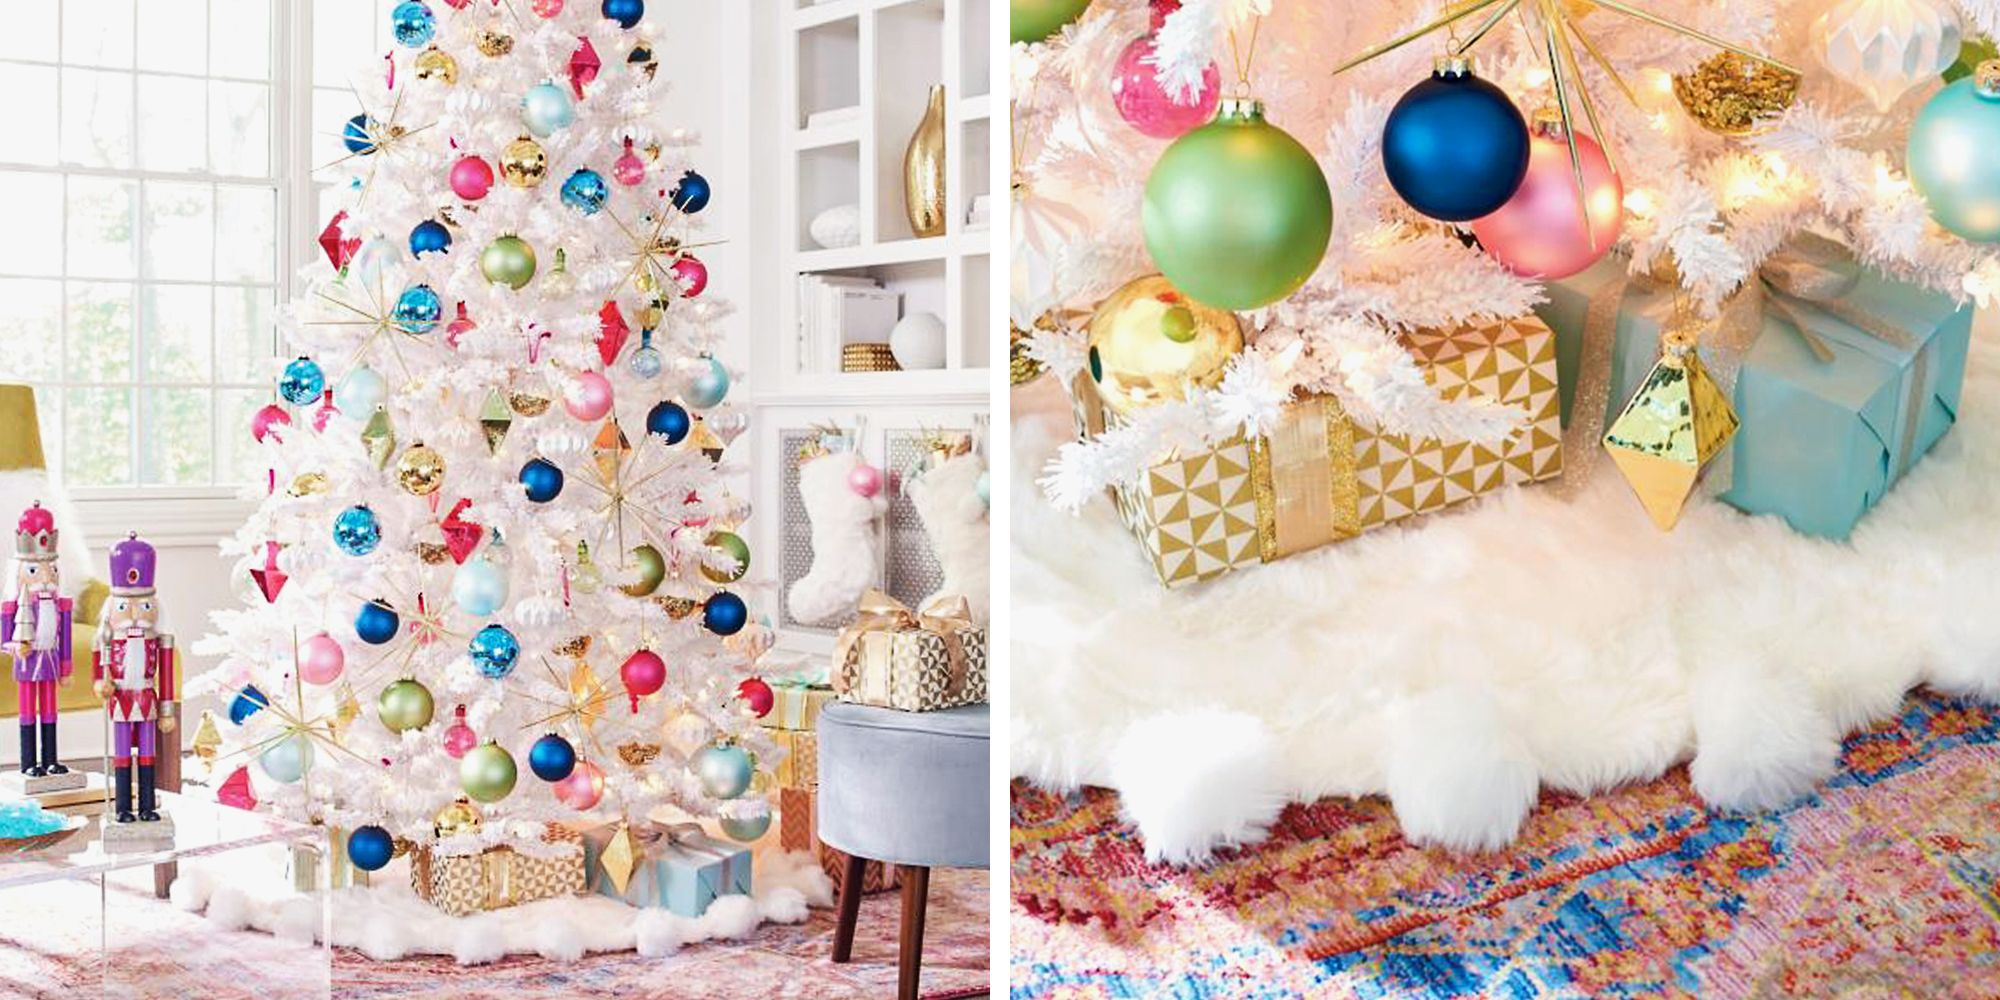 10 Best Christmas Tree Skirts For 2018 Elegant White Gold Red Tree Skirts